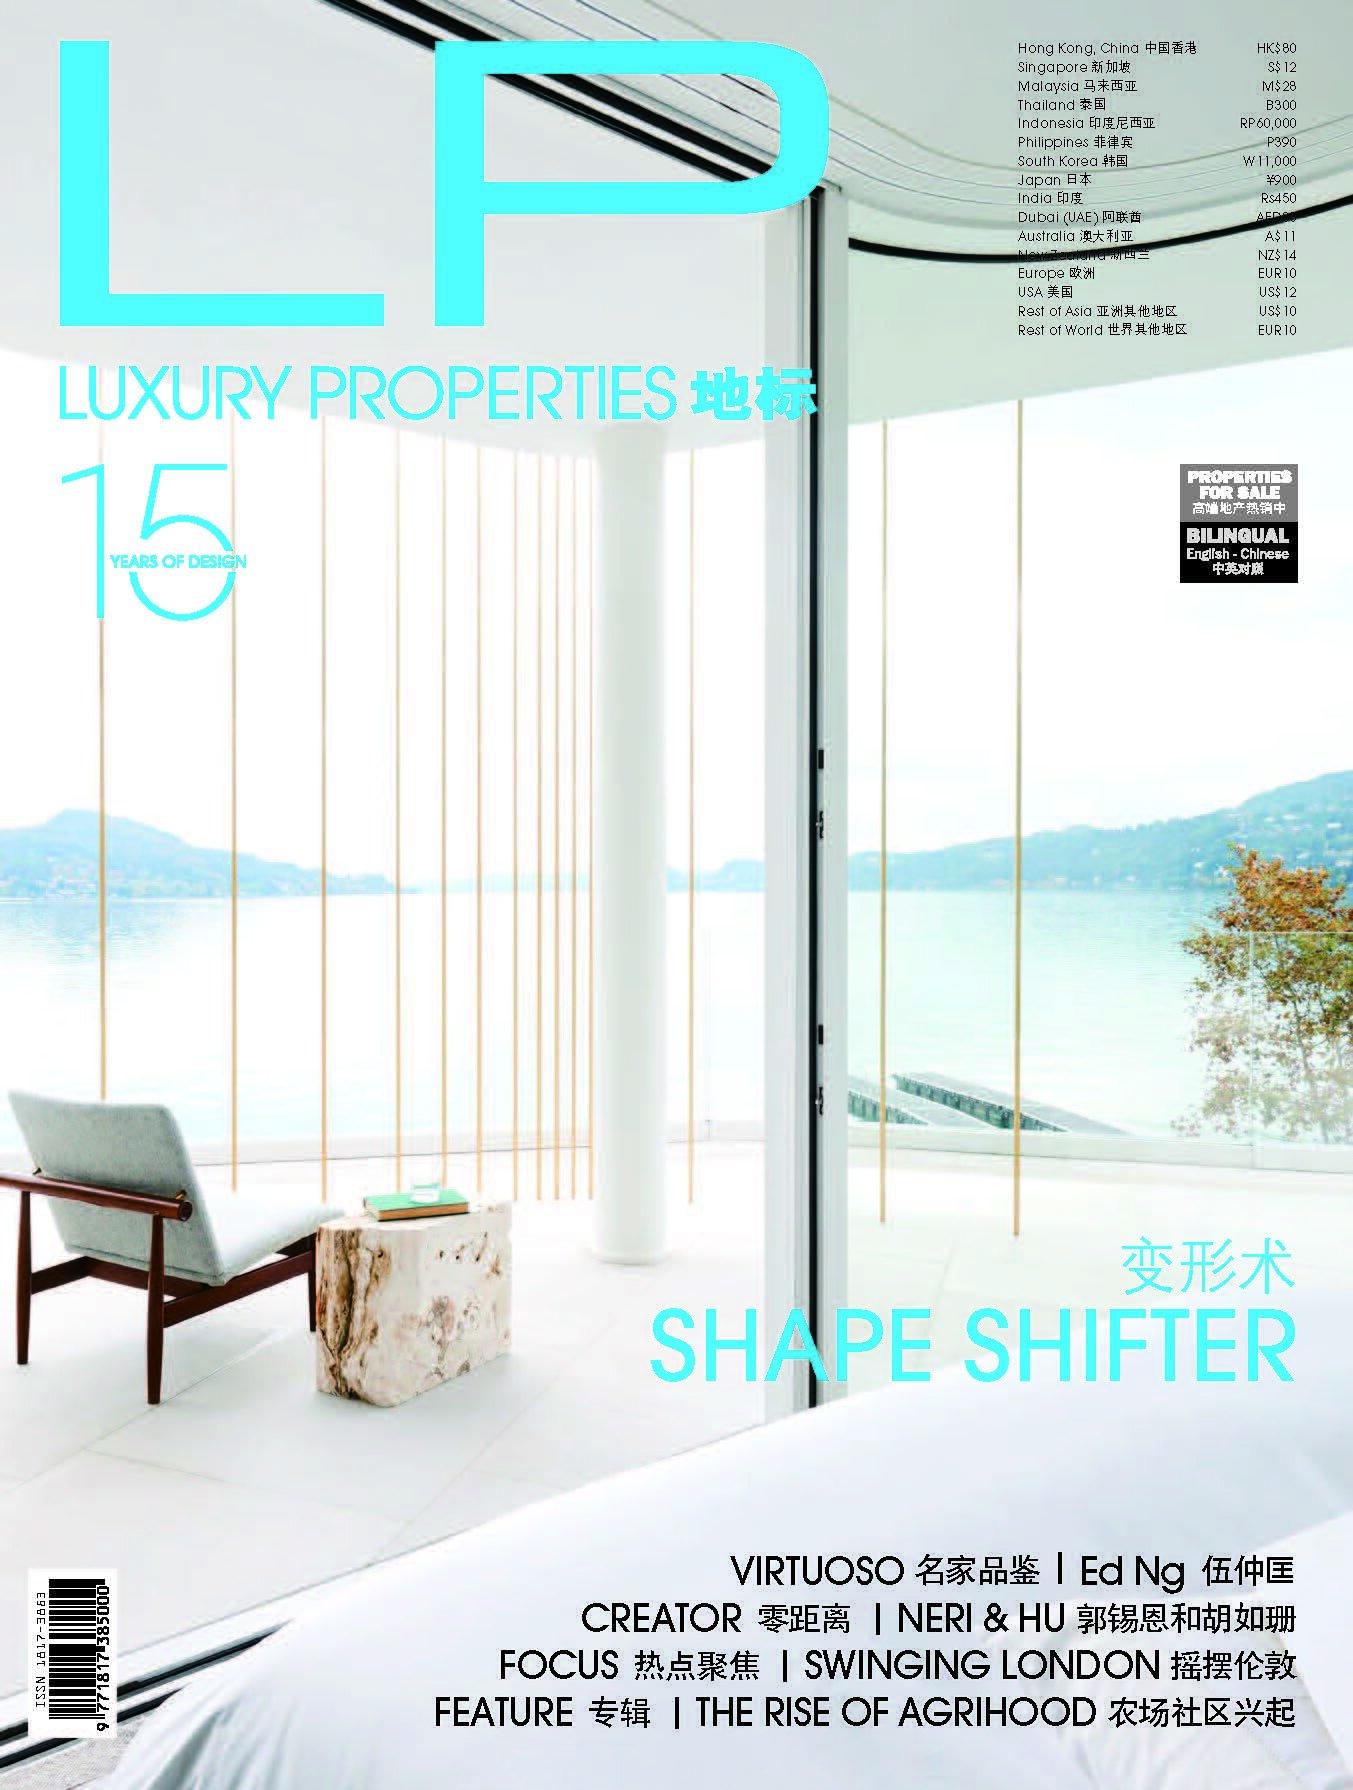 LP 59 Cover.jpg